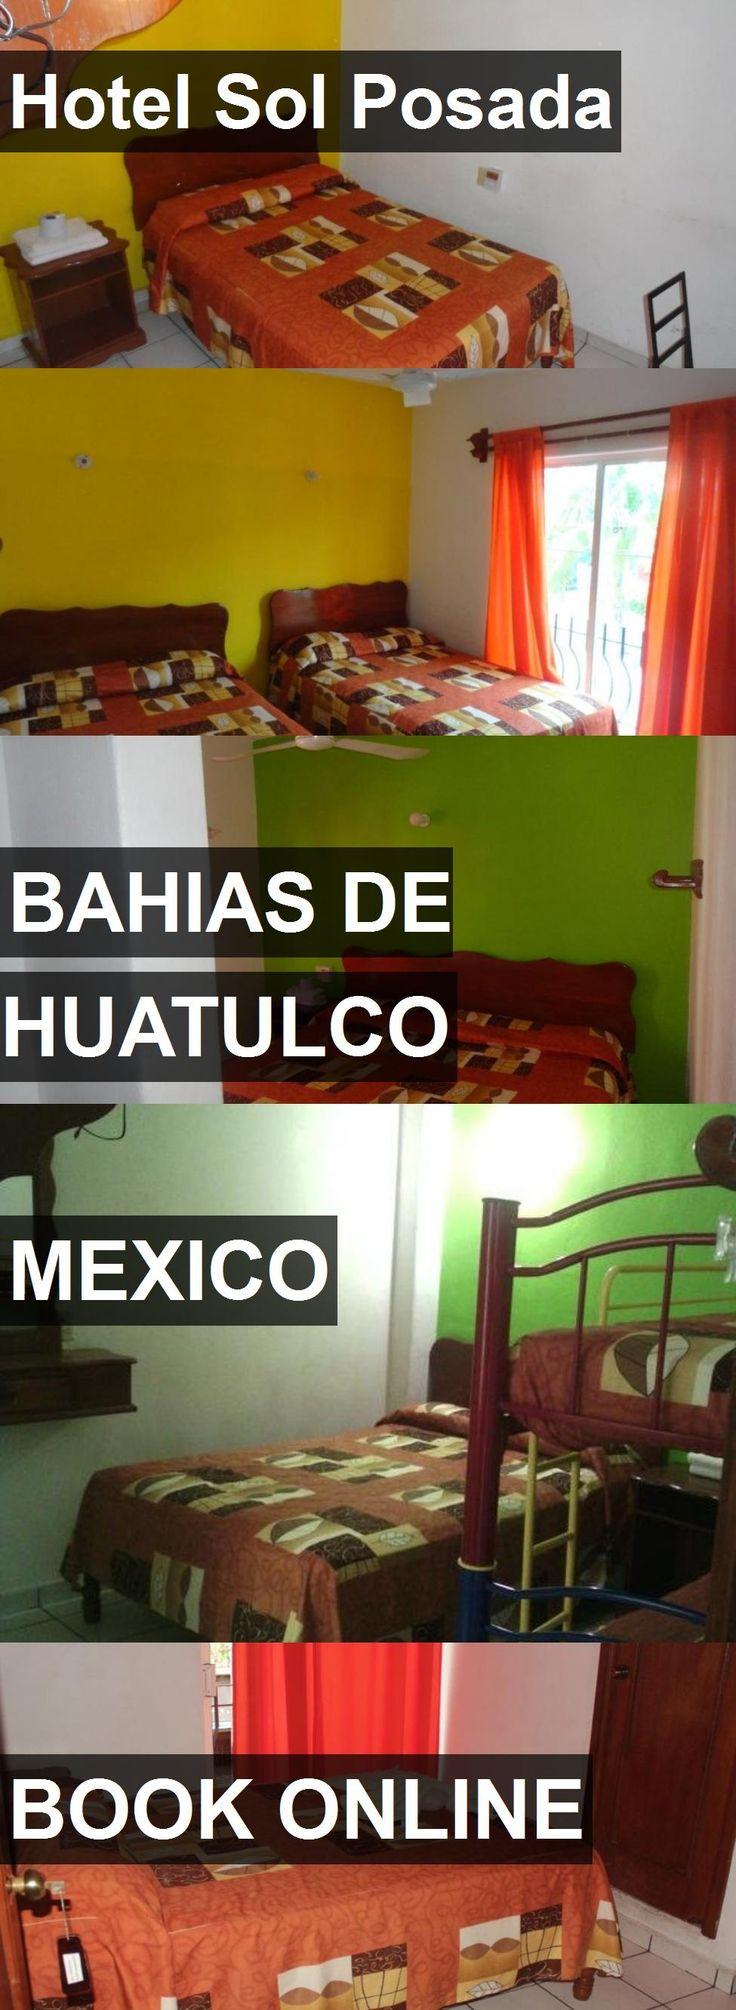 Hotel Hotel Sol Posada in Bahias de Huatulco, Mexico. For more information, photos, reviews and best prices please follow the link. #Mexico #BahiasdeHuatulco #HotelSolPosada #hotel #travel #vacation